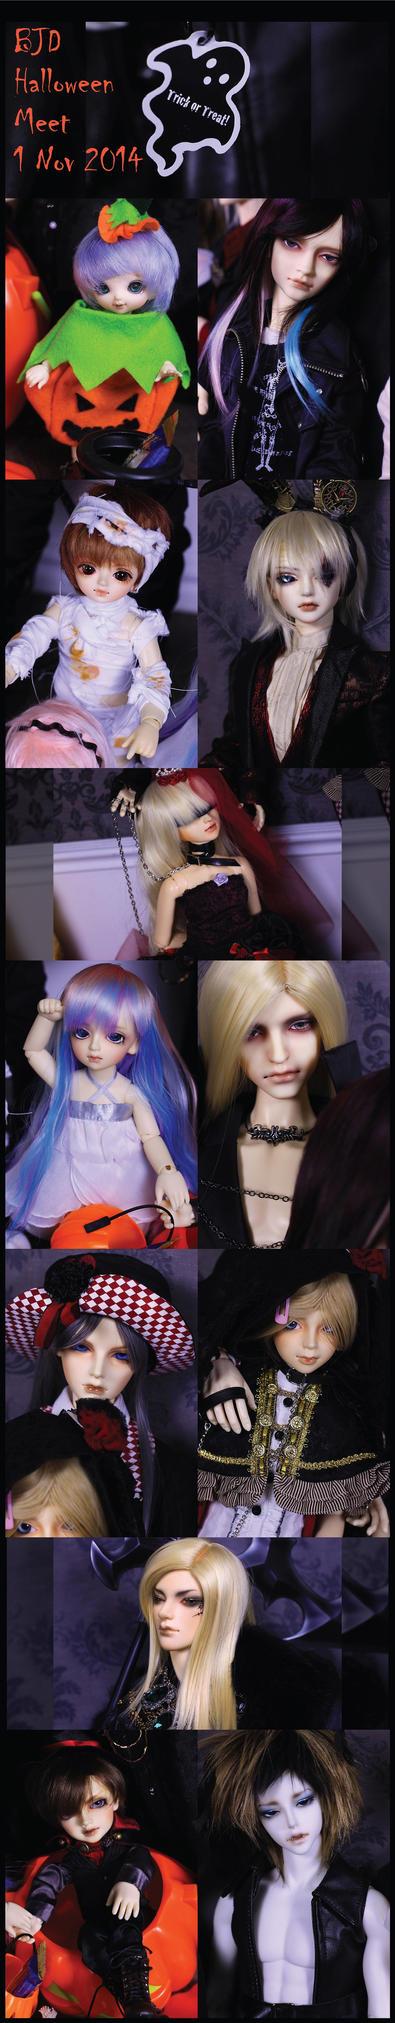 BJD Halloween Meet 2014 - I by eli-star